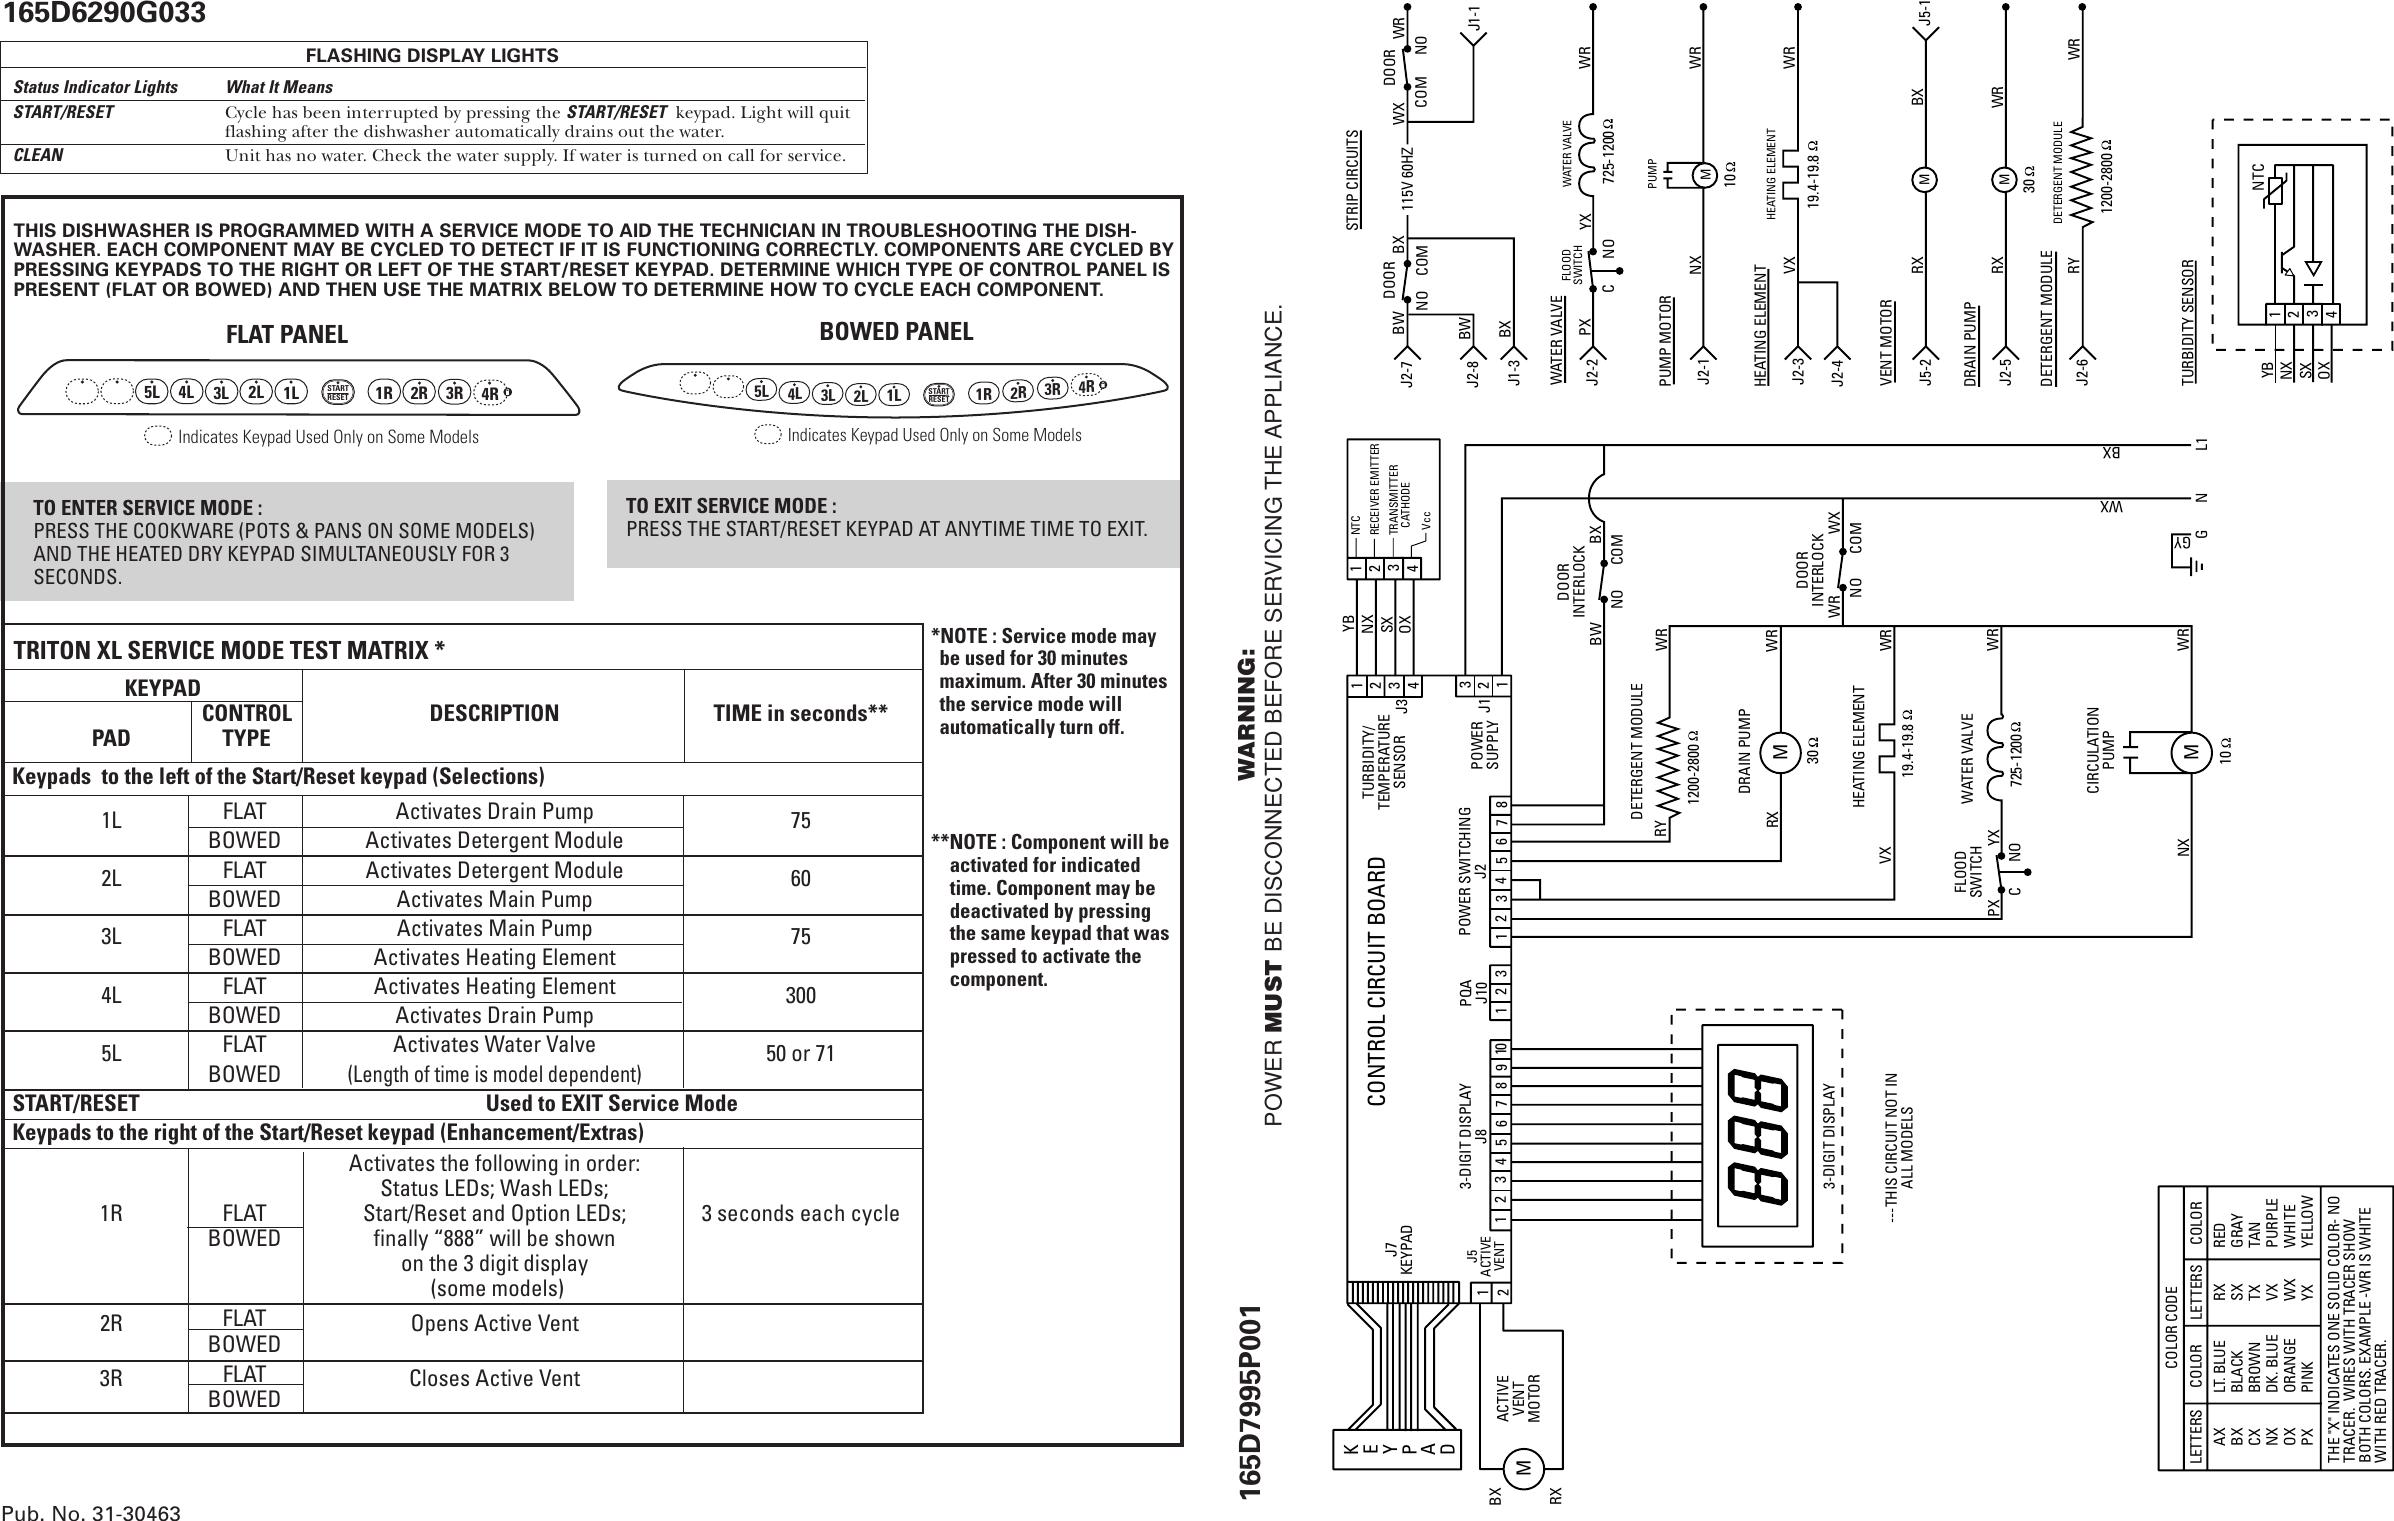 913 07 165d7996p001 Ge Dishwasher Mini Manual 31 30463